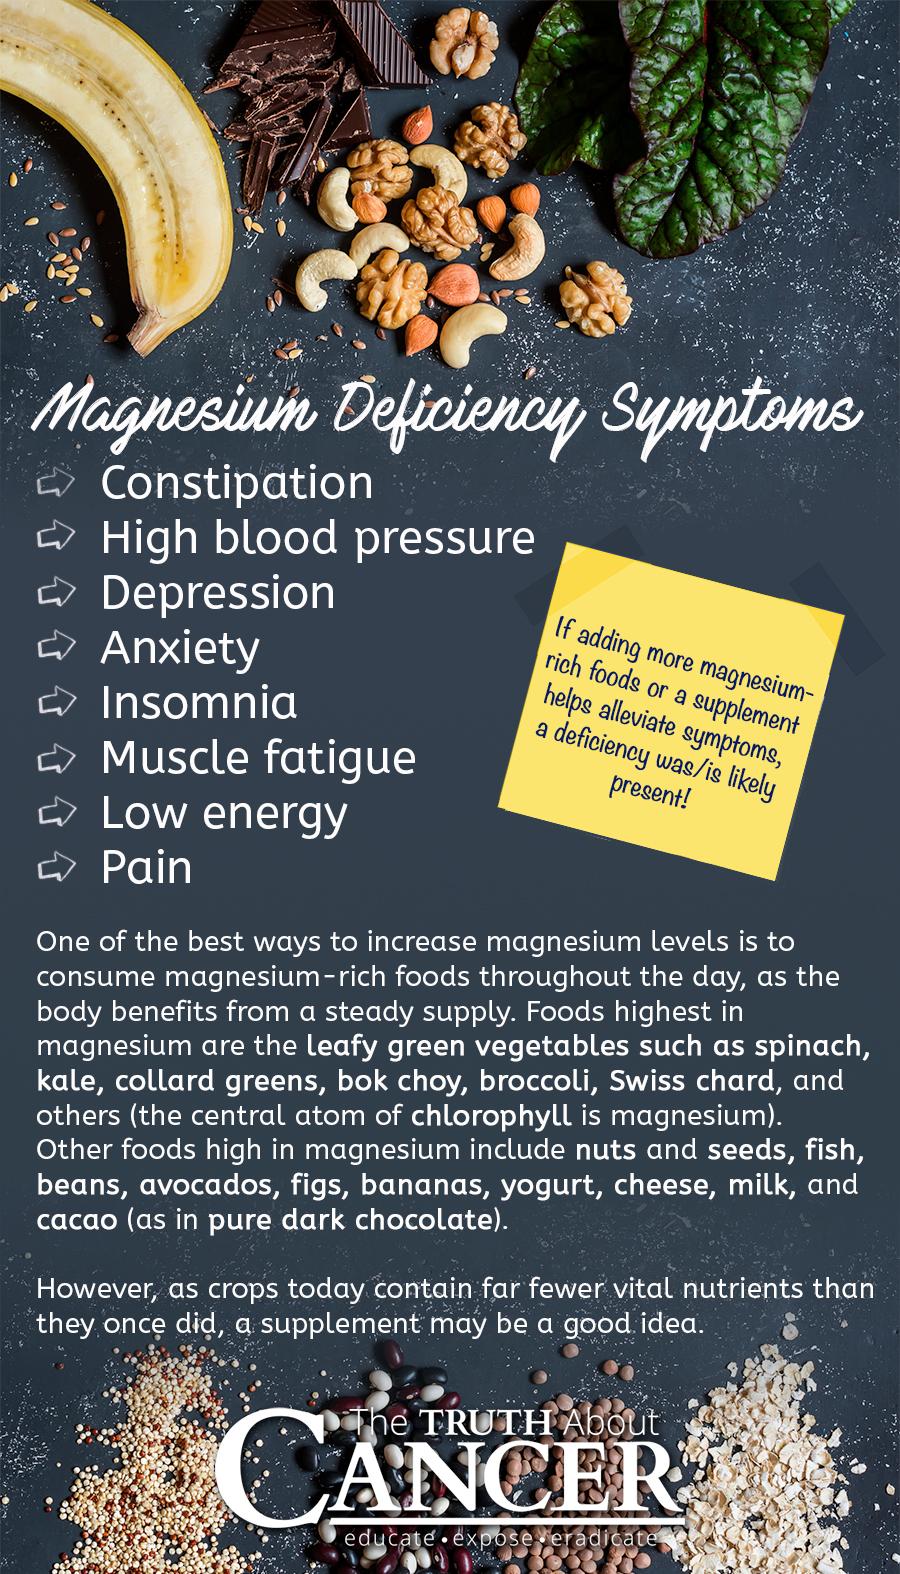 magnesium-deficiency-symptoms-list